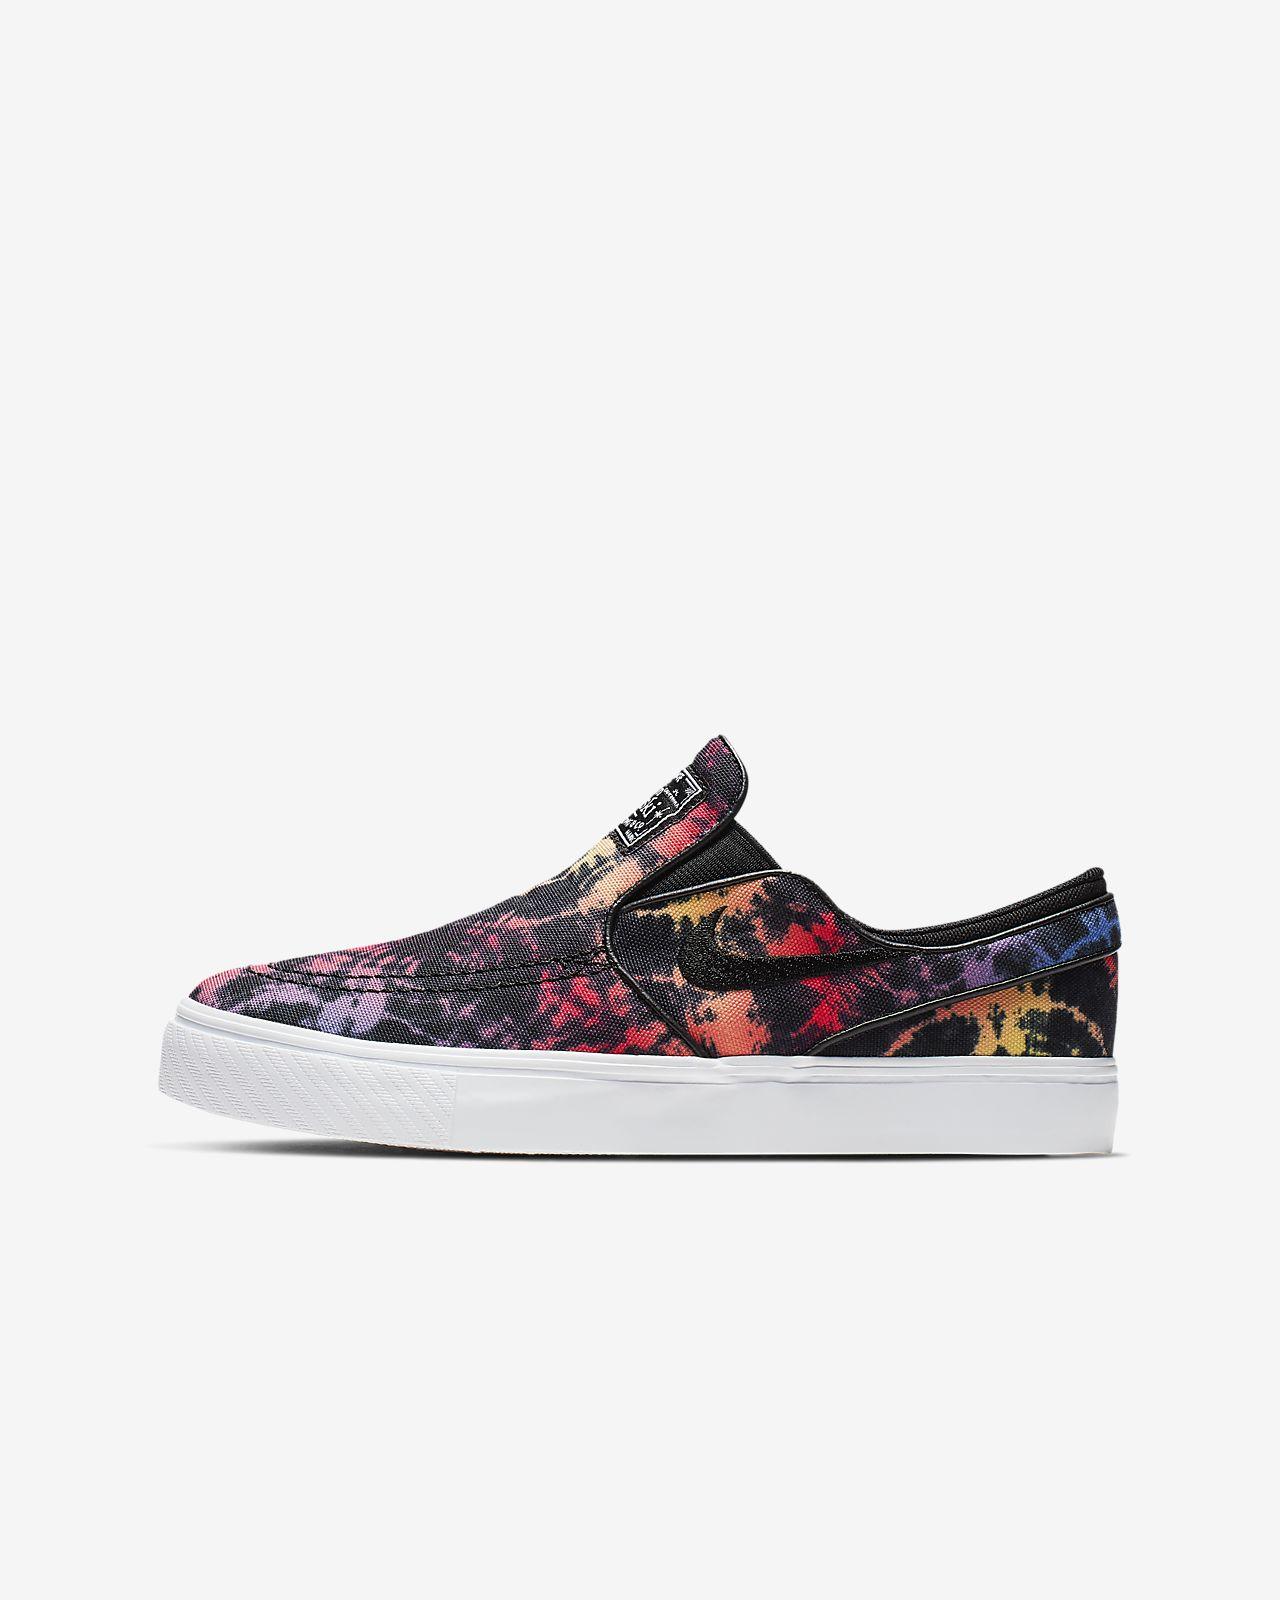 Chaussure de skateboard Nike SB Stefan Janoski Canvas Slip Tie Dye pour Enfant plus âgé